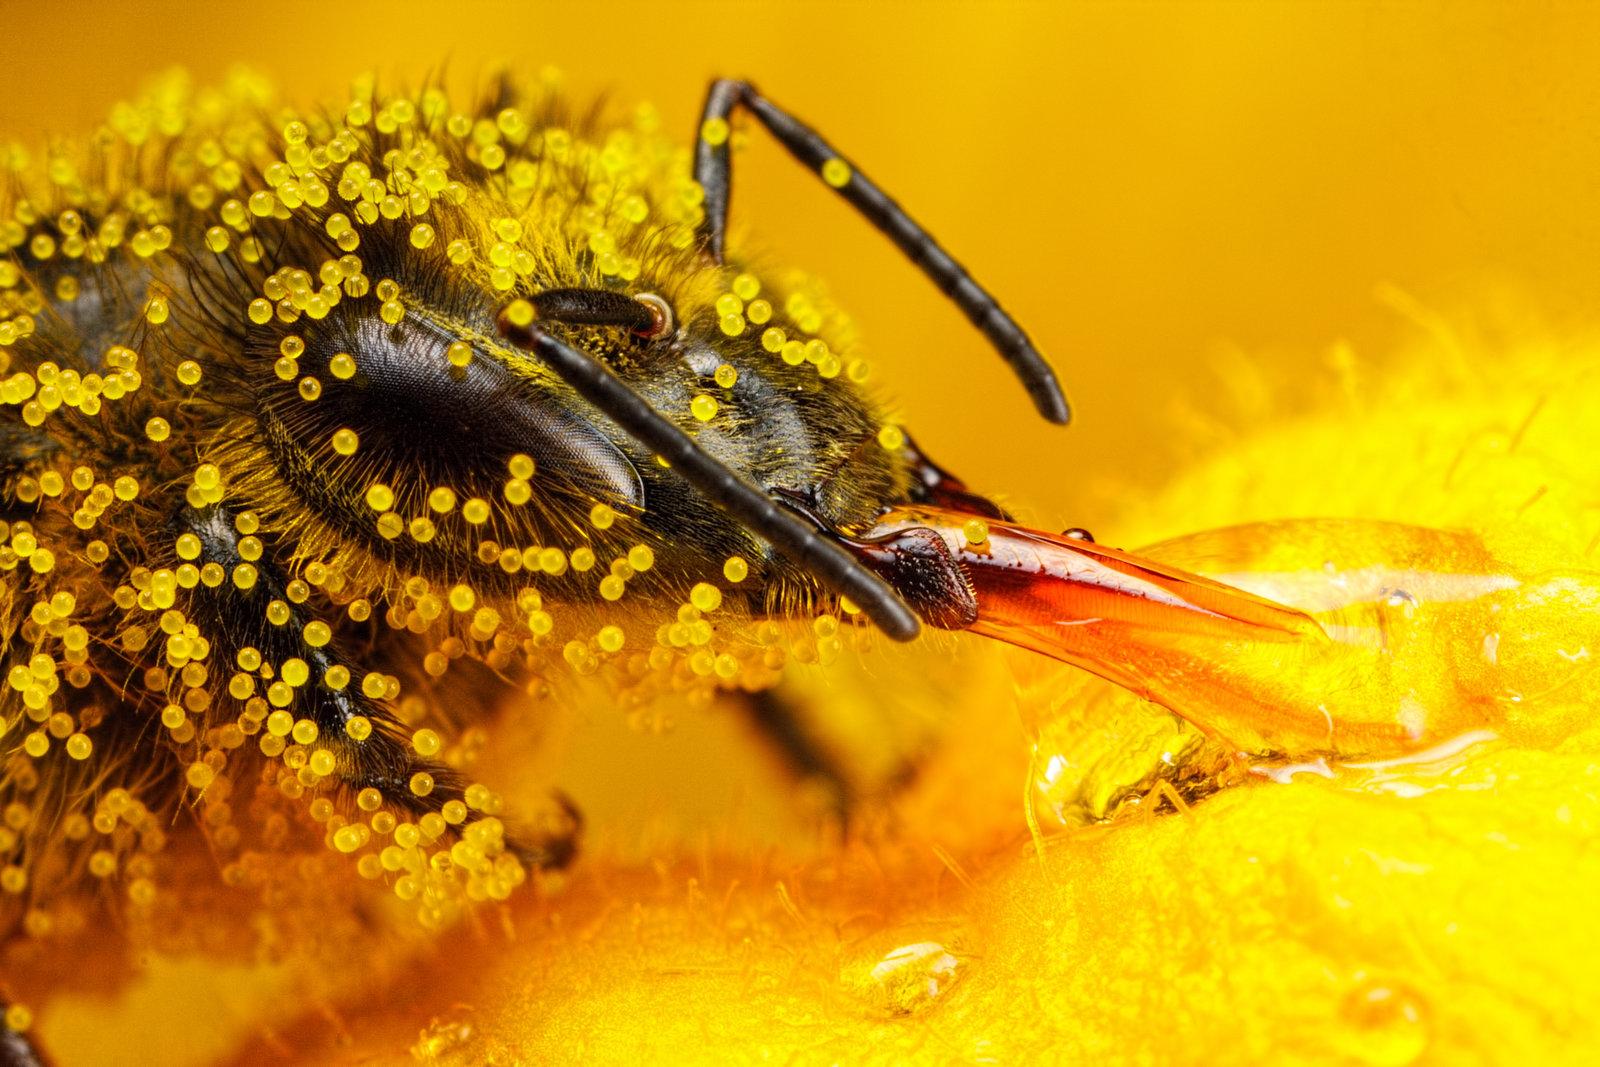 Sự thật về mật ong